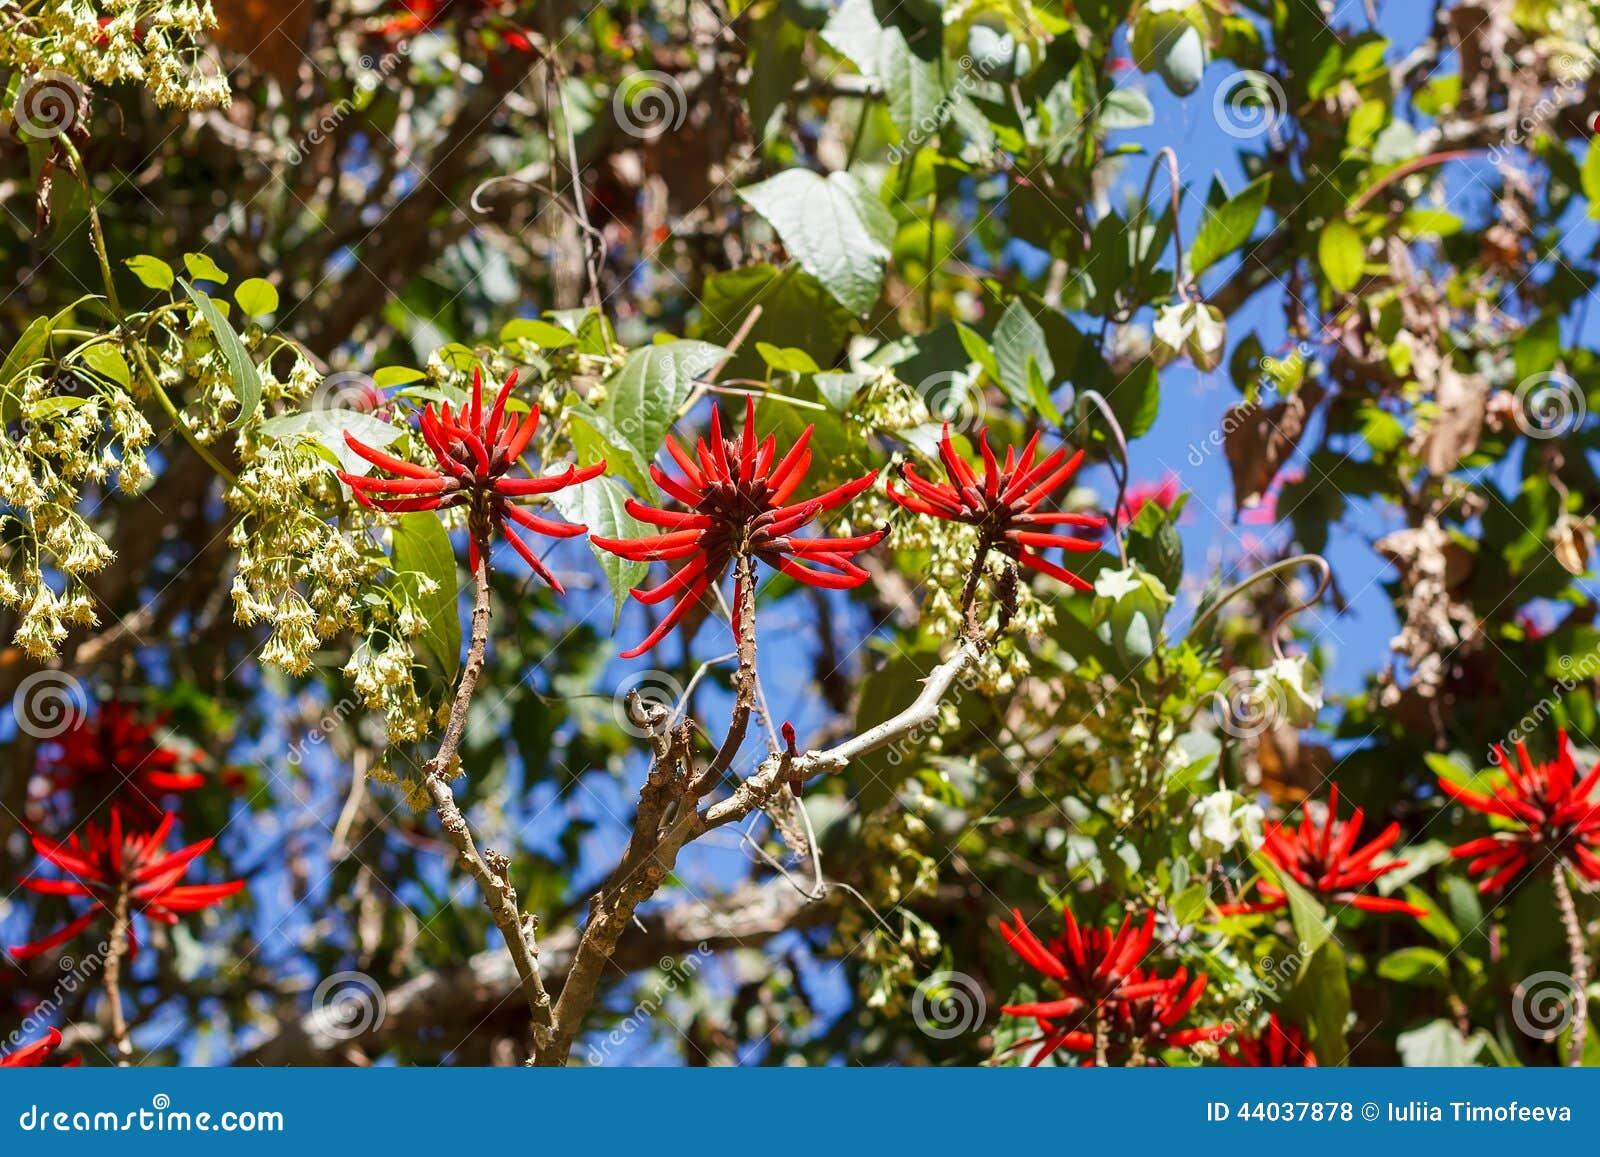 Red flowers of brazilian tree Erythrina speciosa (Coral tree, Fl